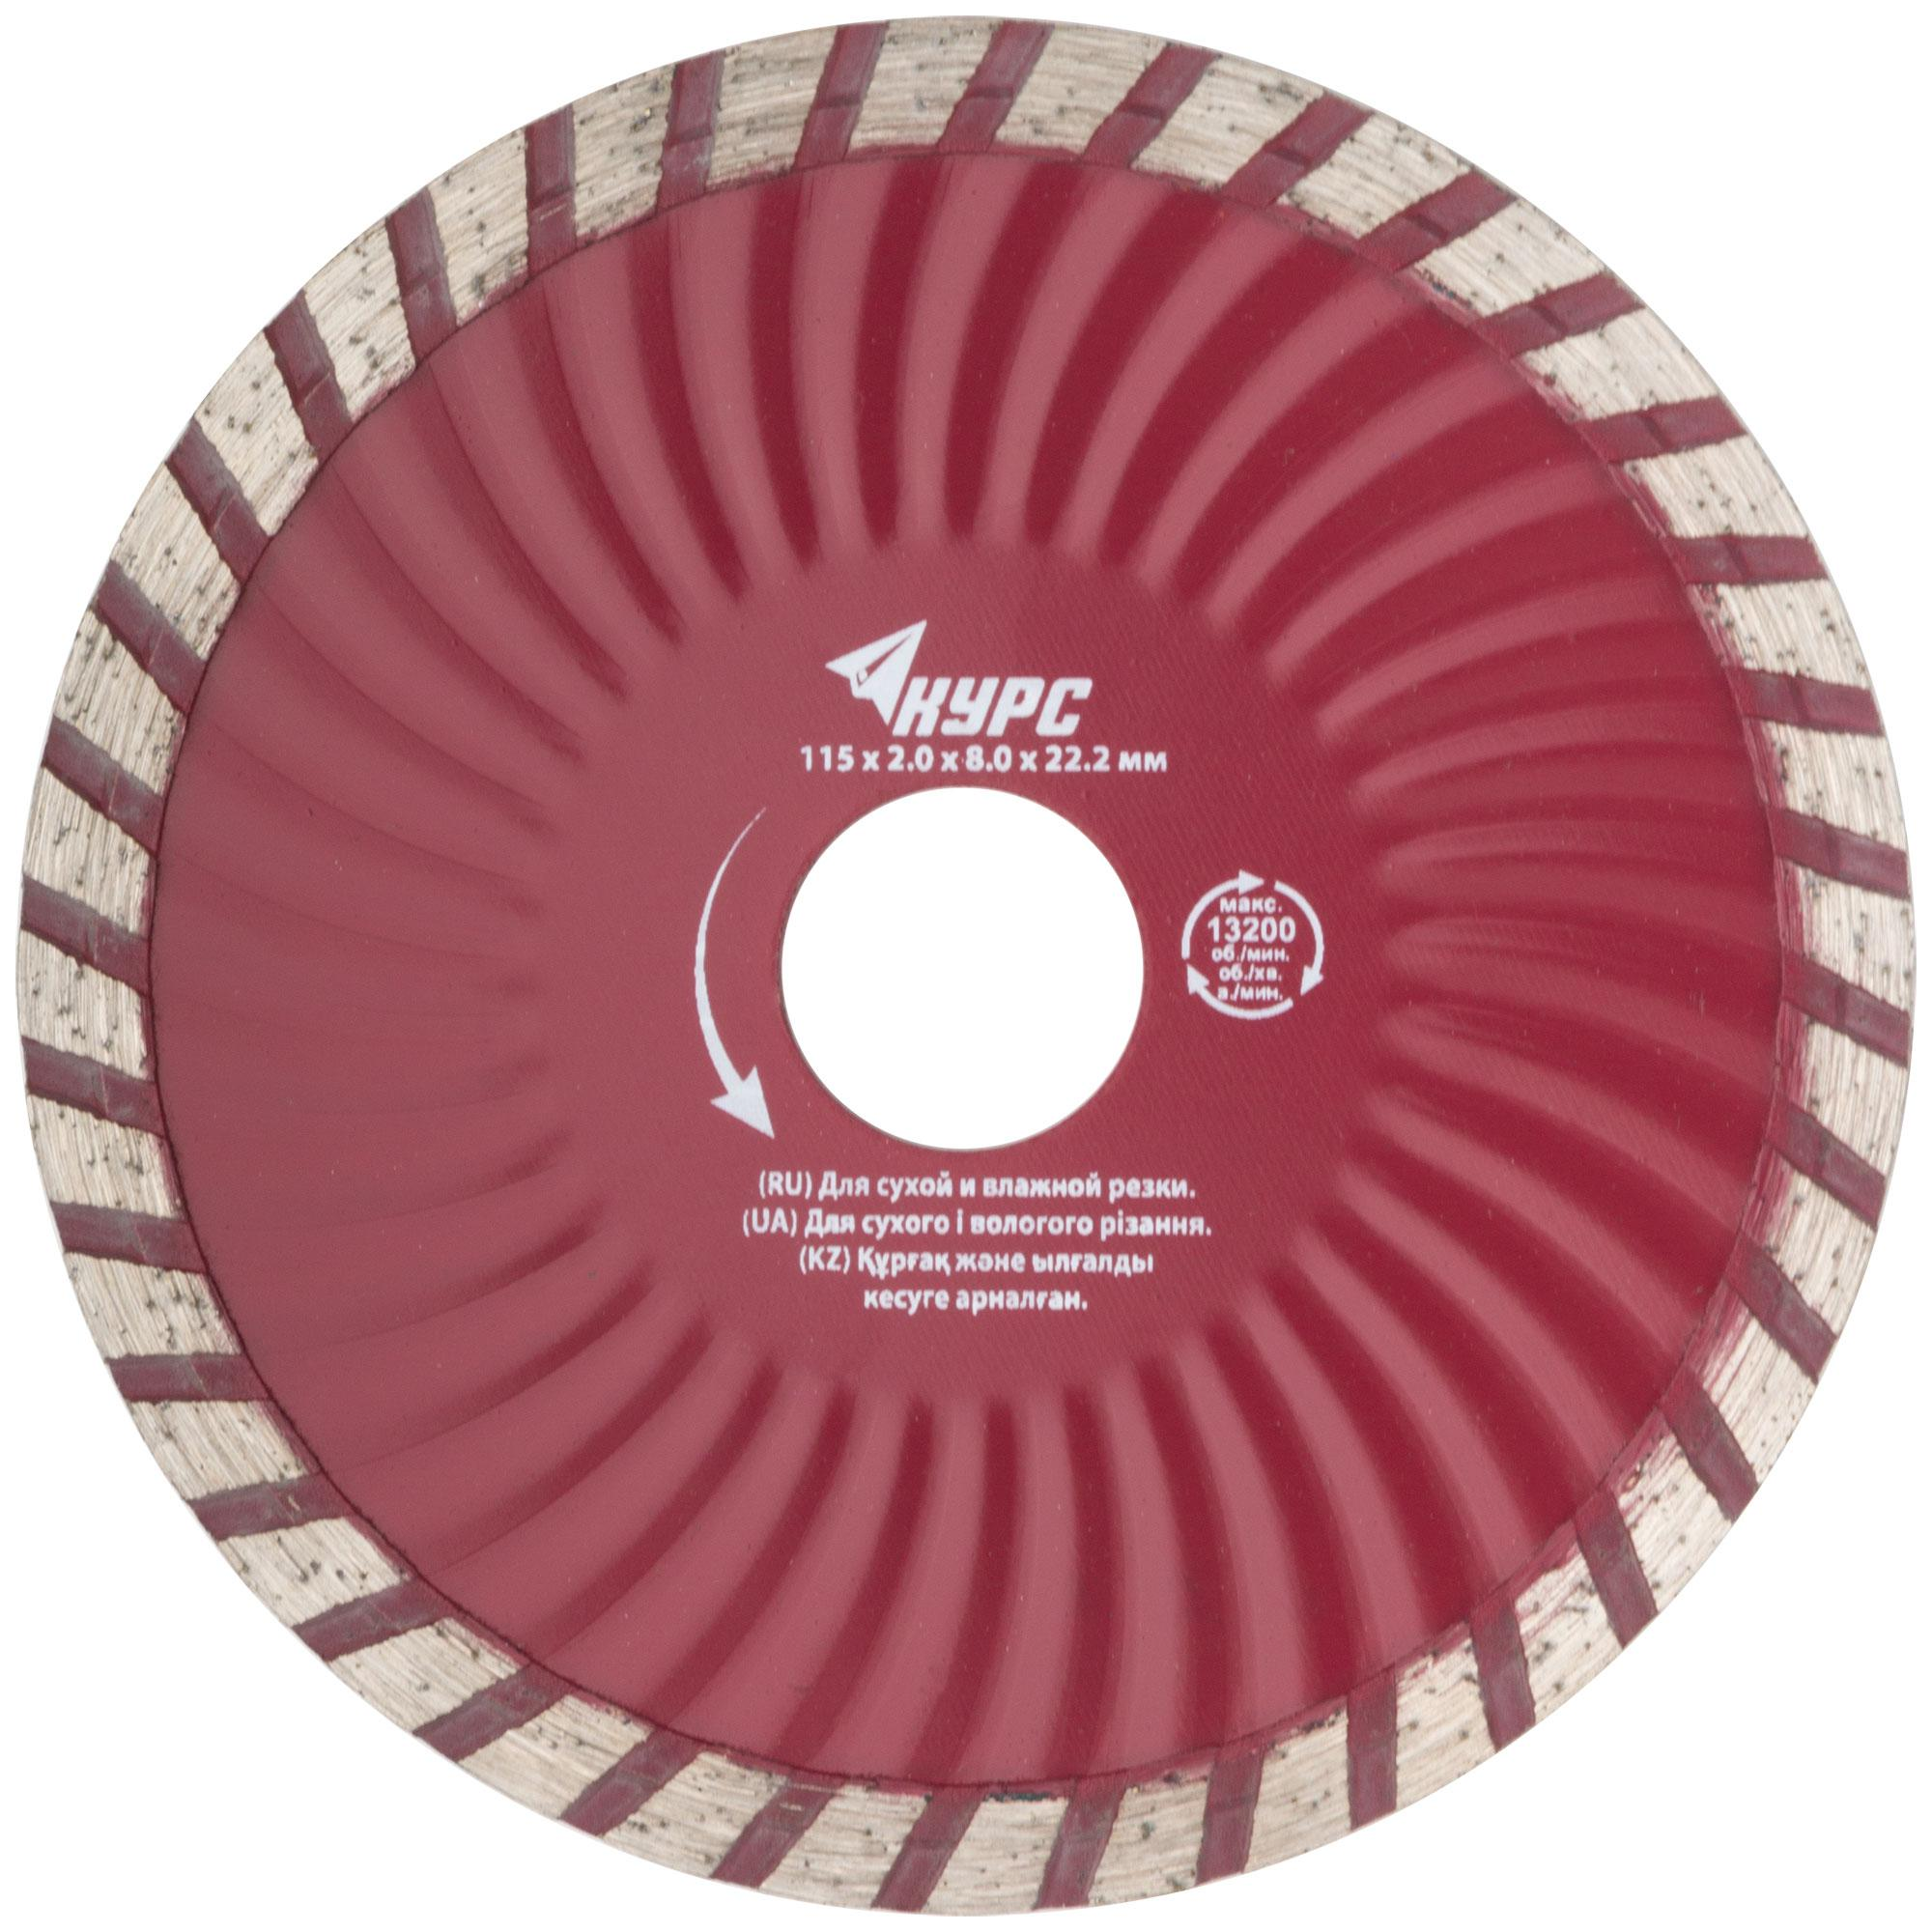 Круг алмазный КУРС 37271 диск отрезной алмазный турбо 125х22 2mm 20007 ottom 125x22 2mm